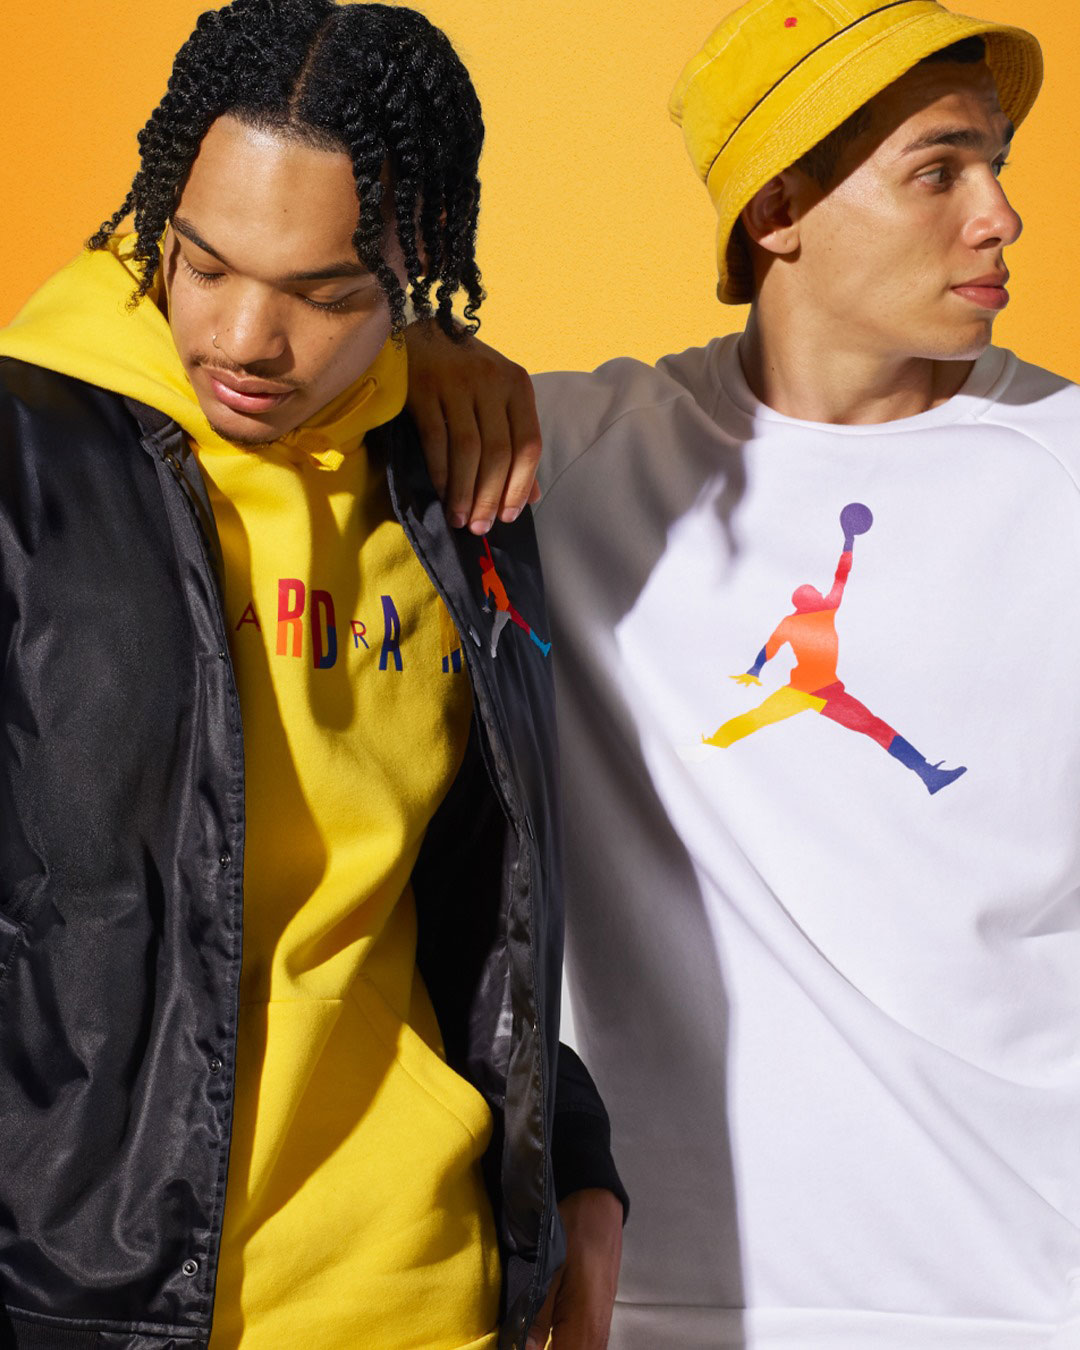 jordan-rivals-clothing-jacket-shirt-hoodie